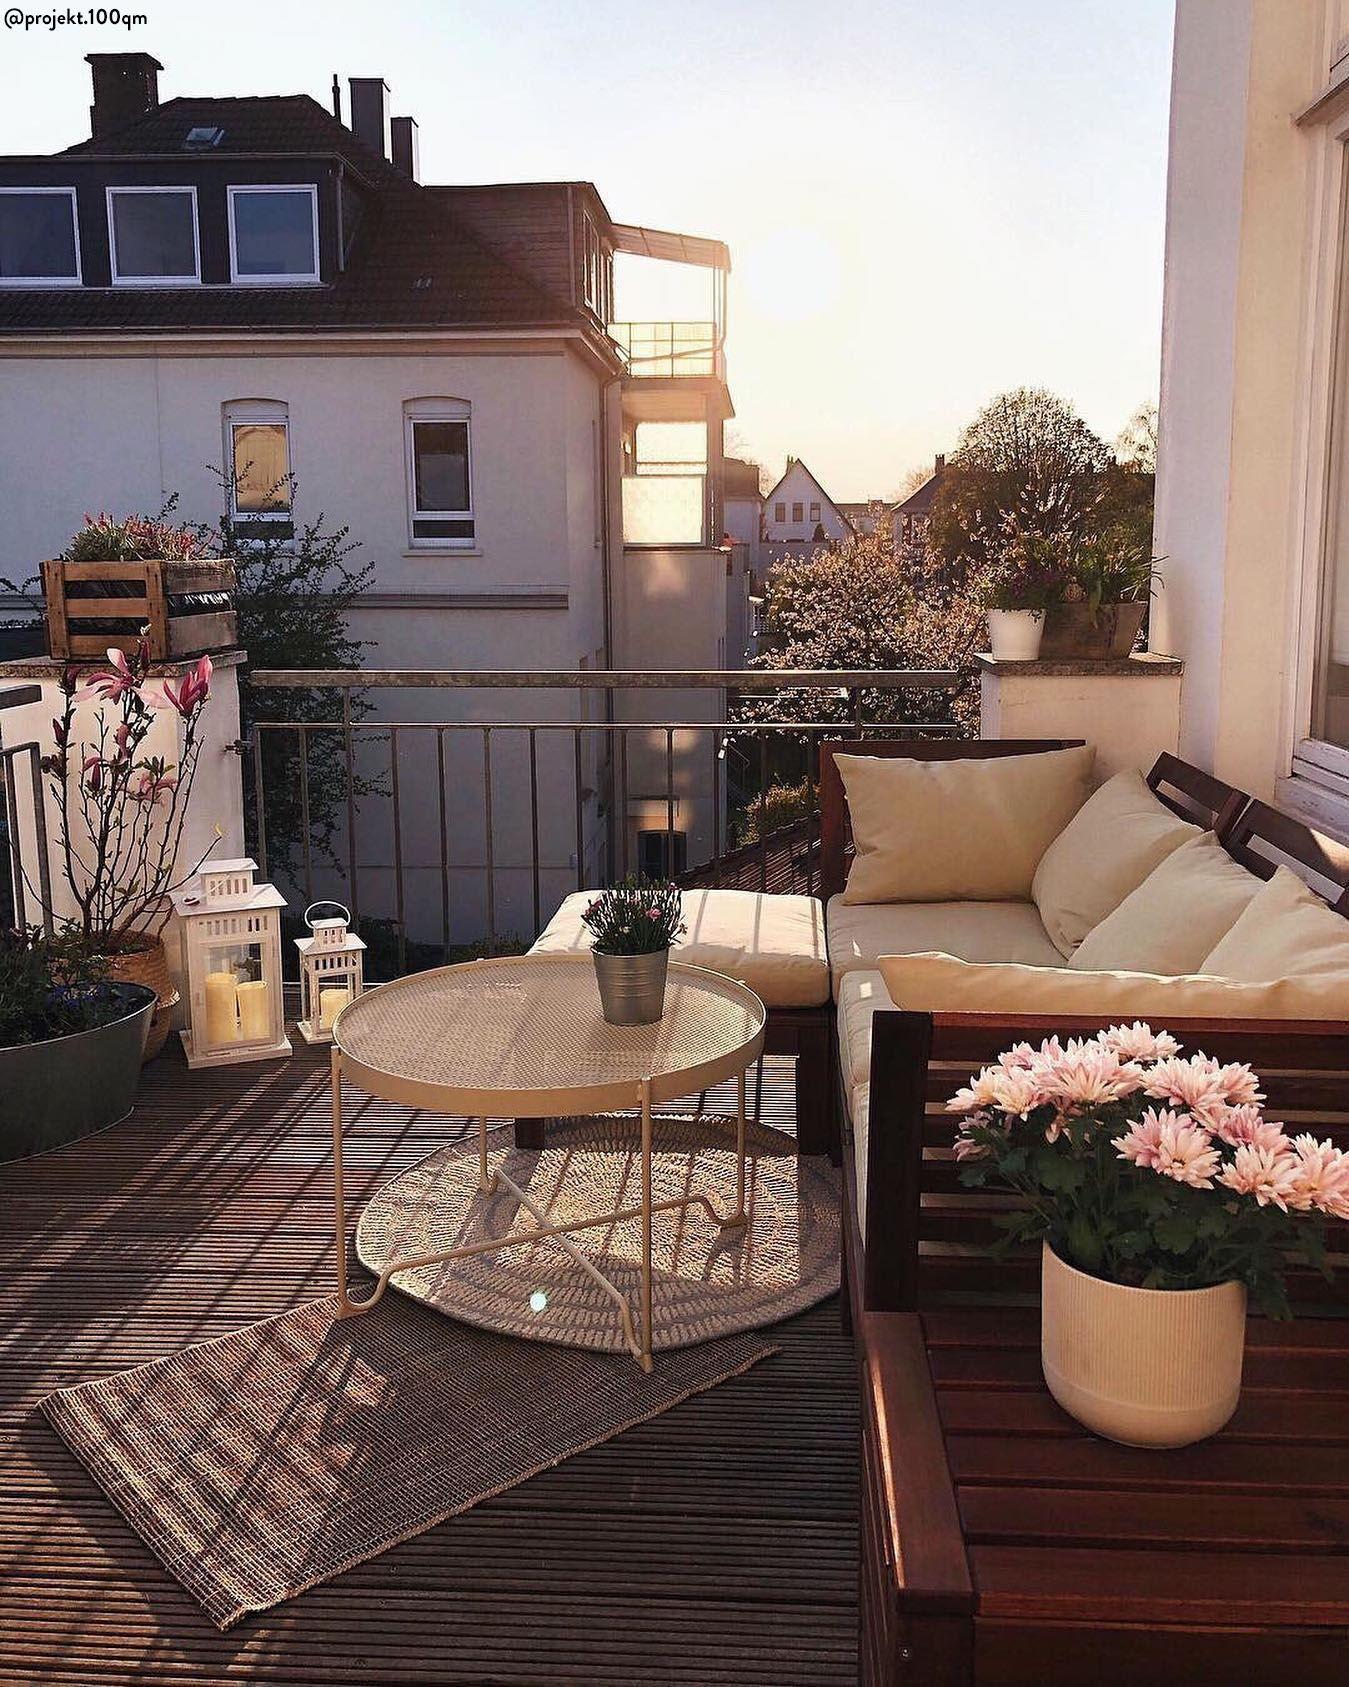 Outdoor Möbel Trends & Styles online kaufen | WestwingNow